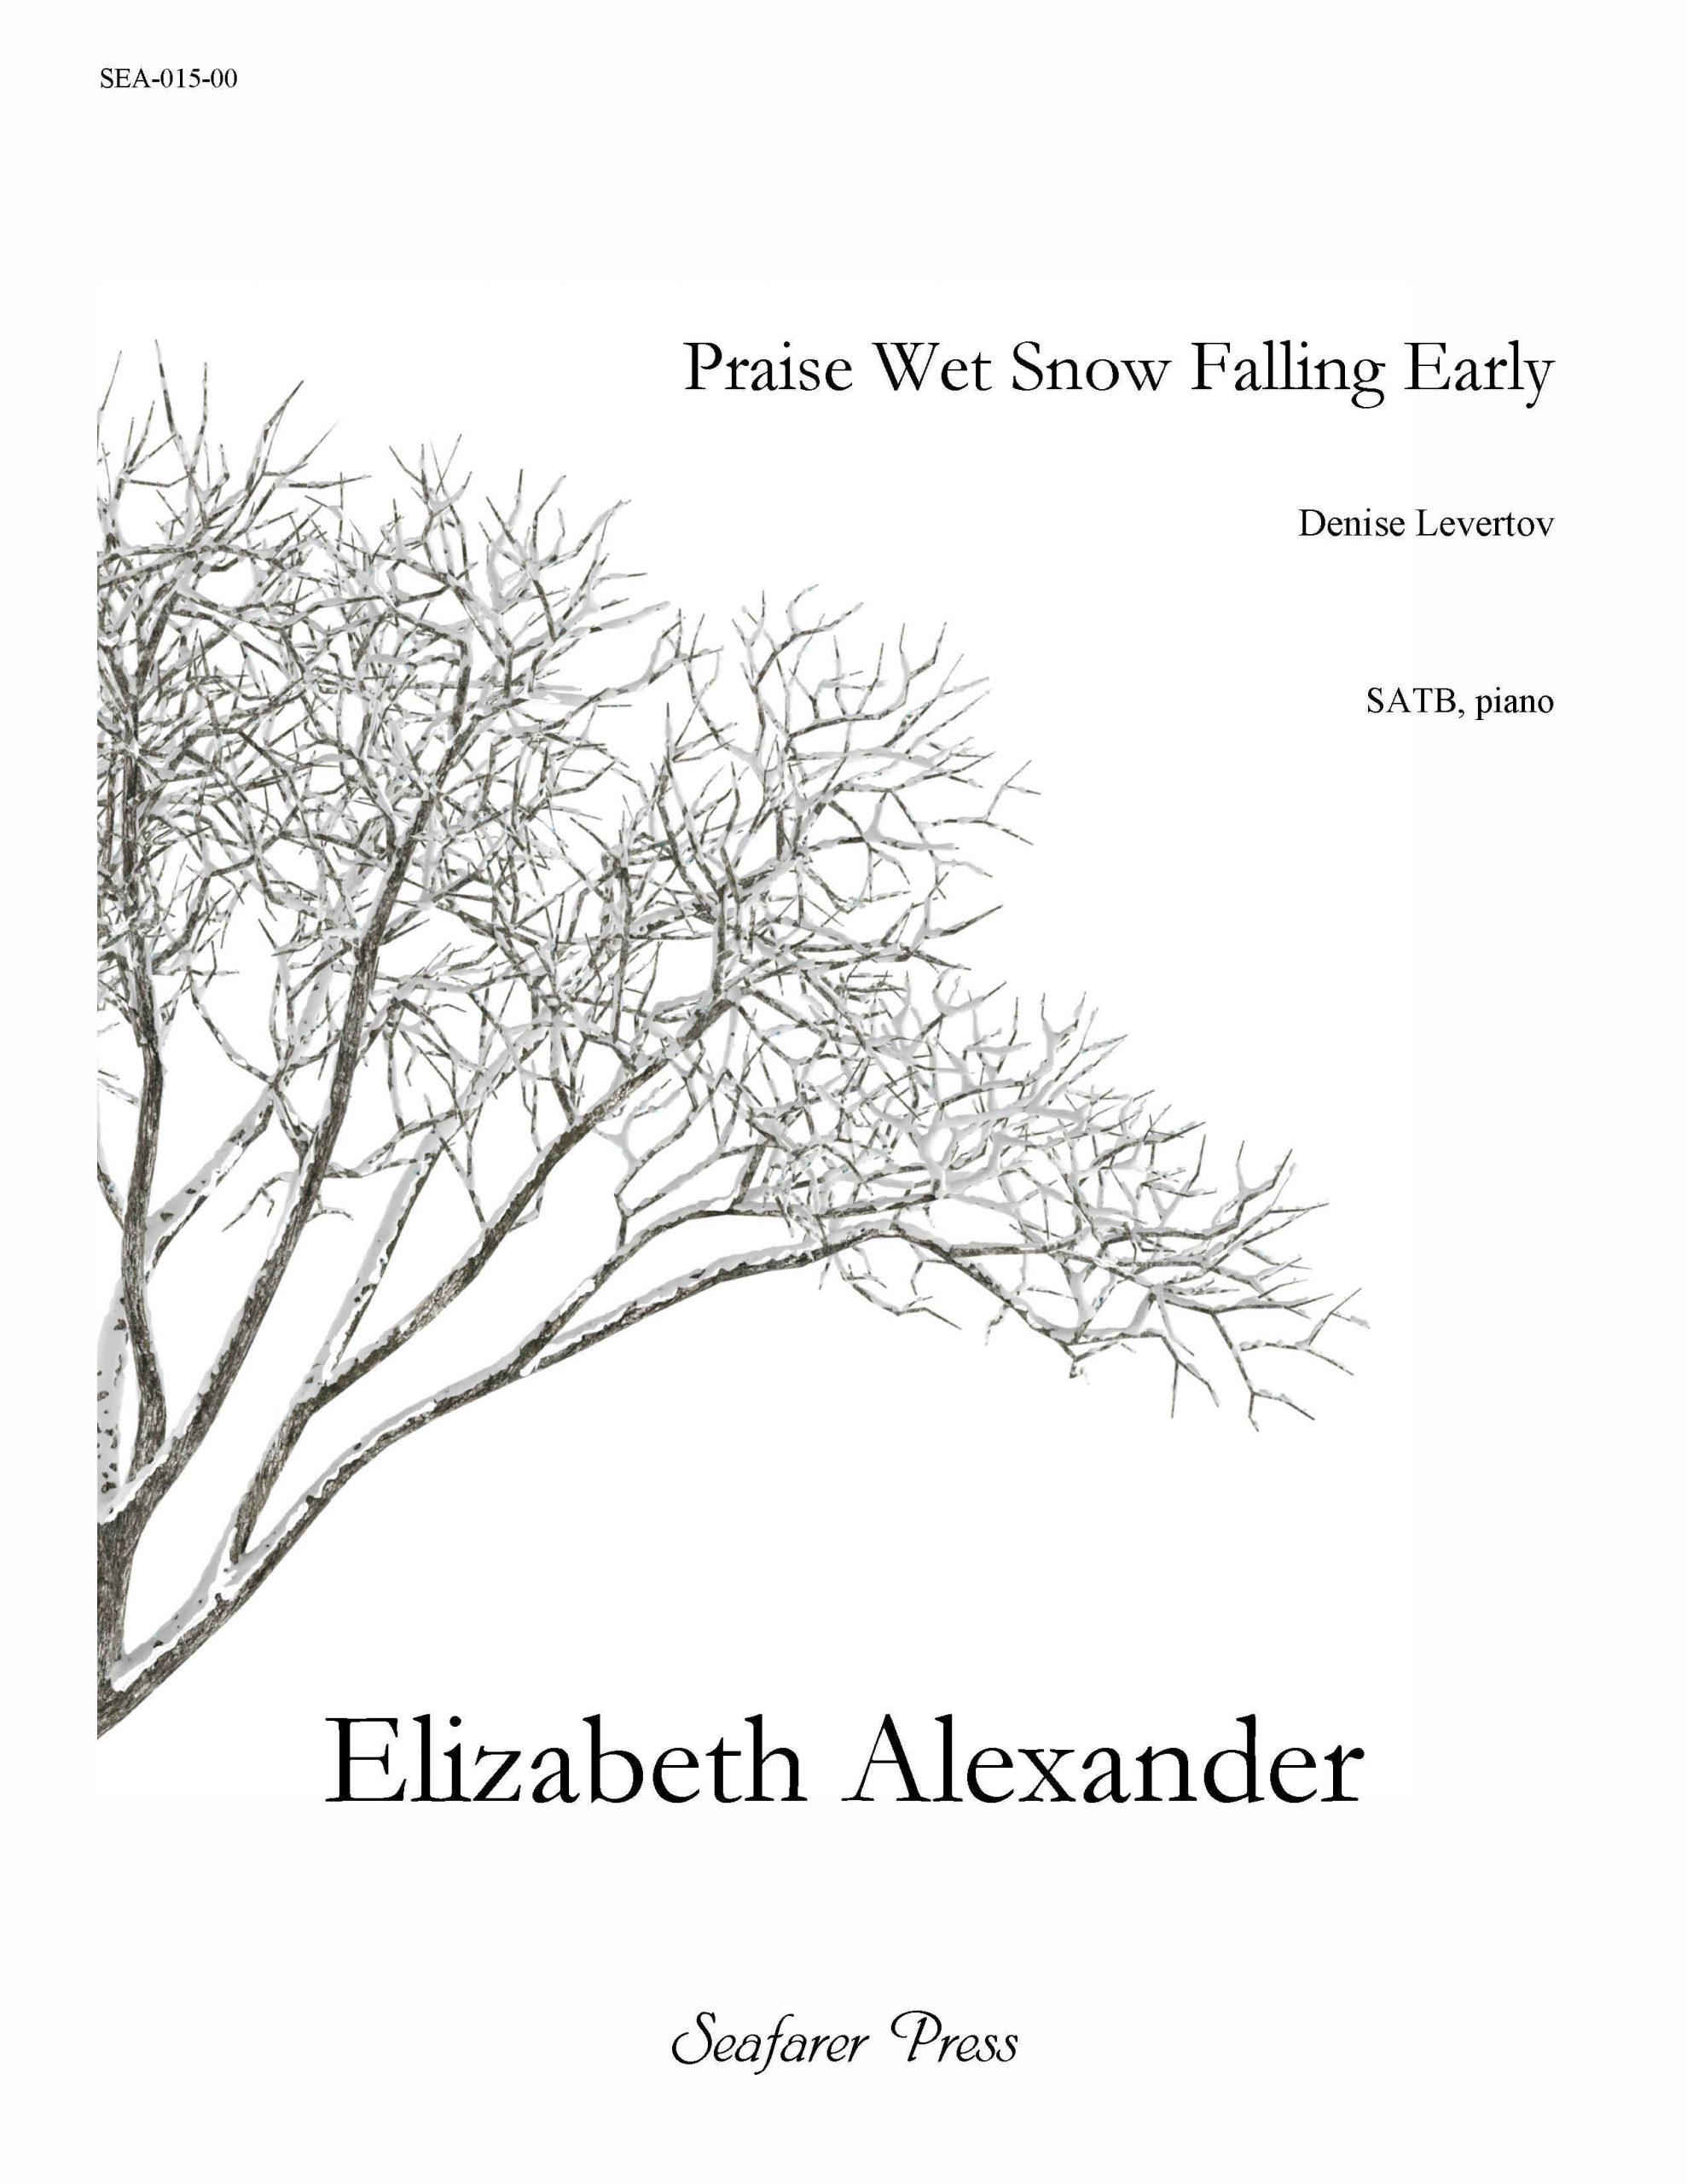 SEA-015-00 - Praise Wet Snow Falling Early